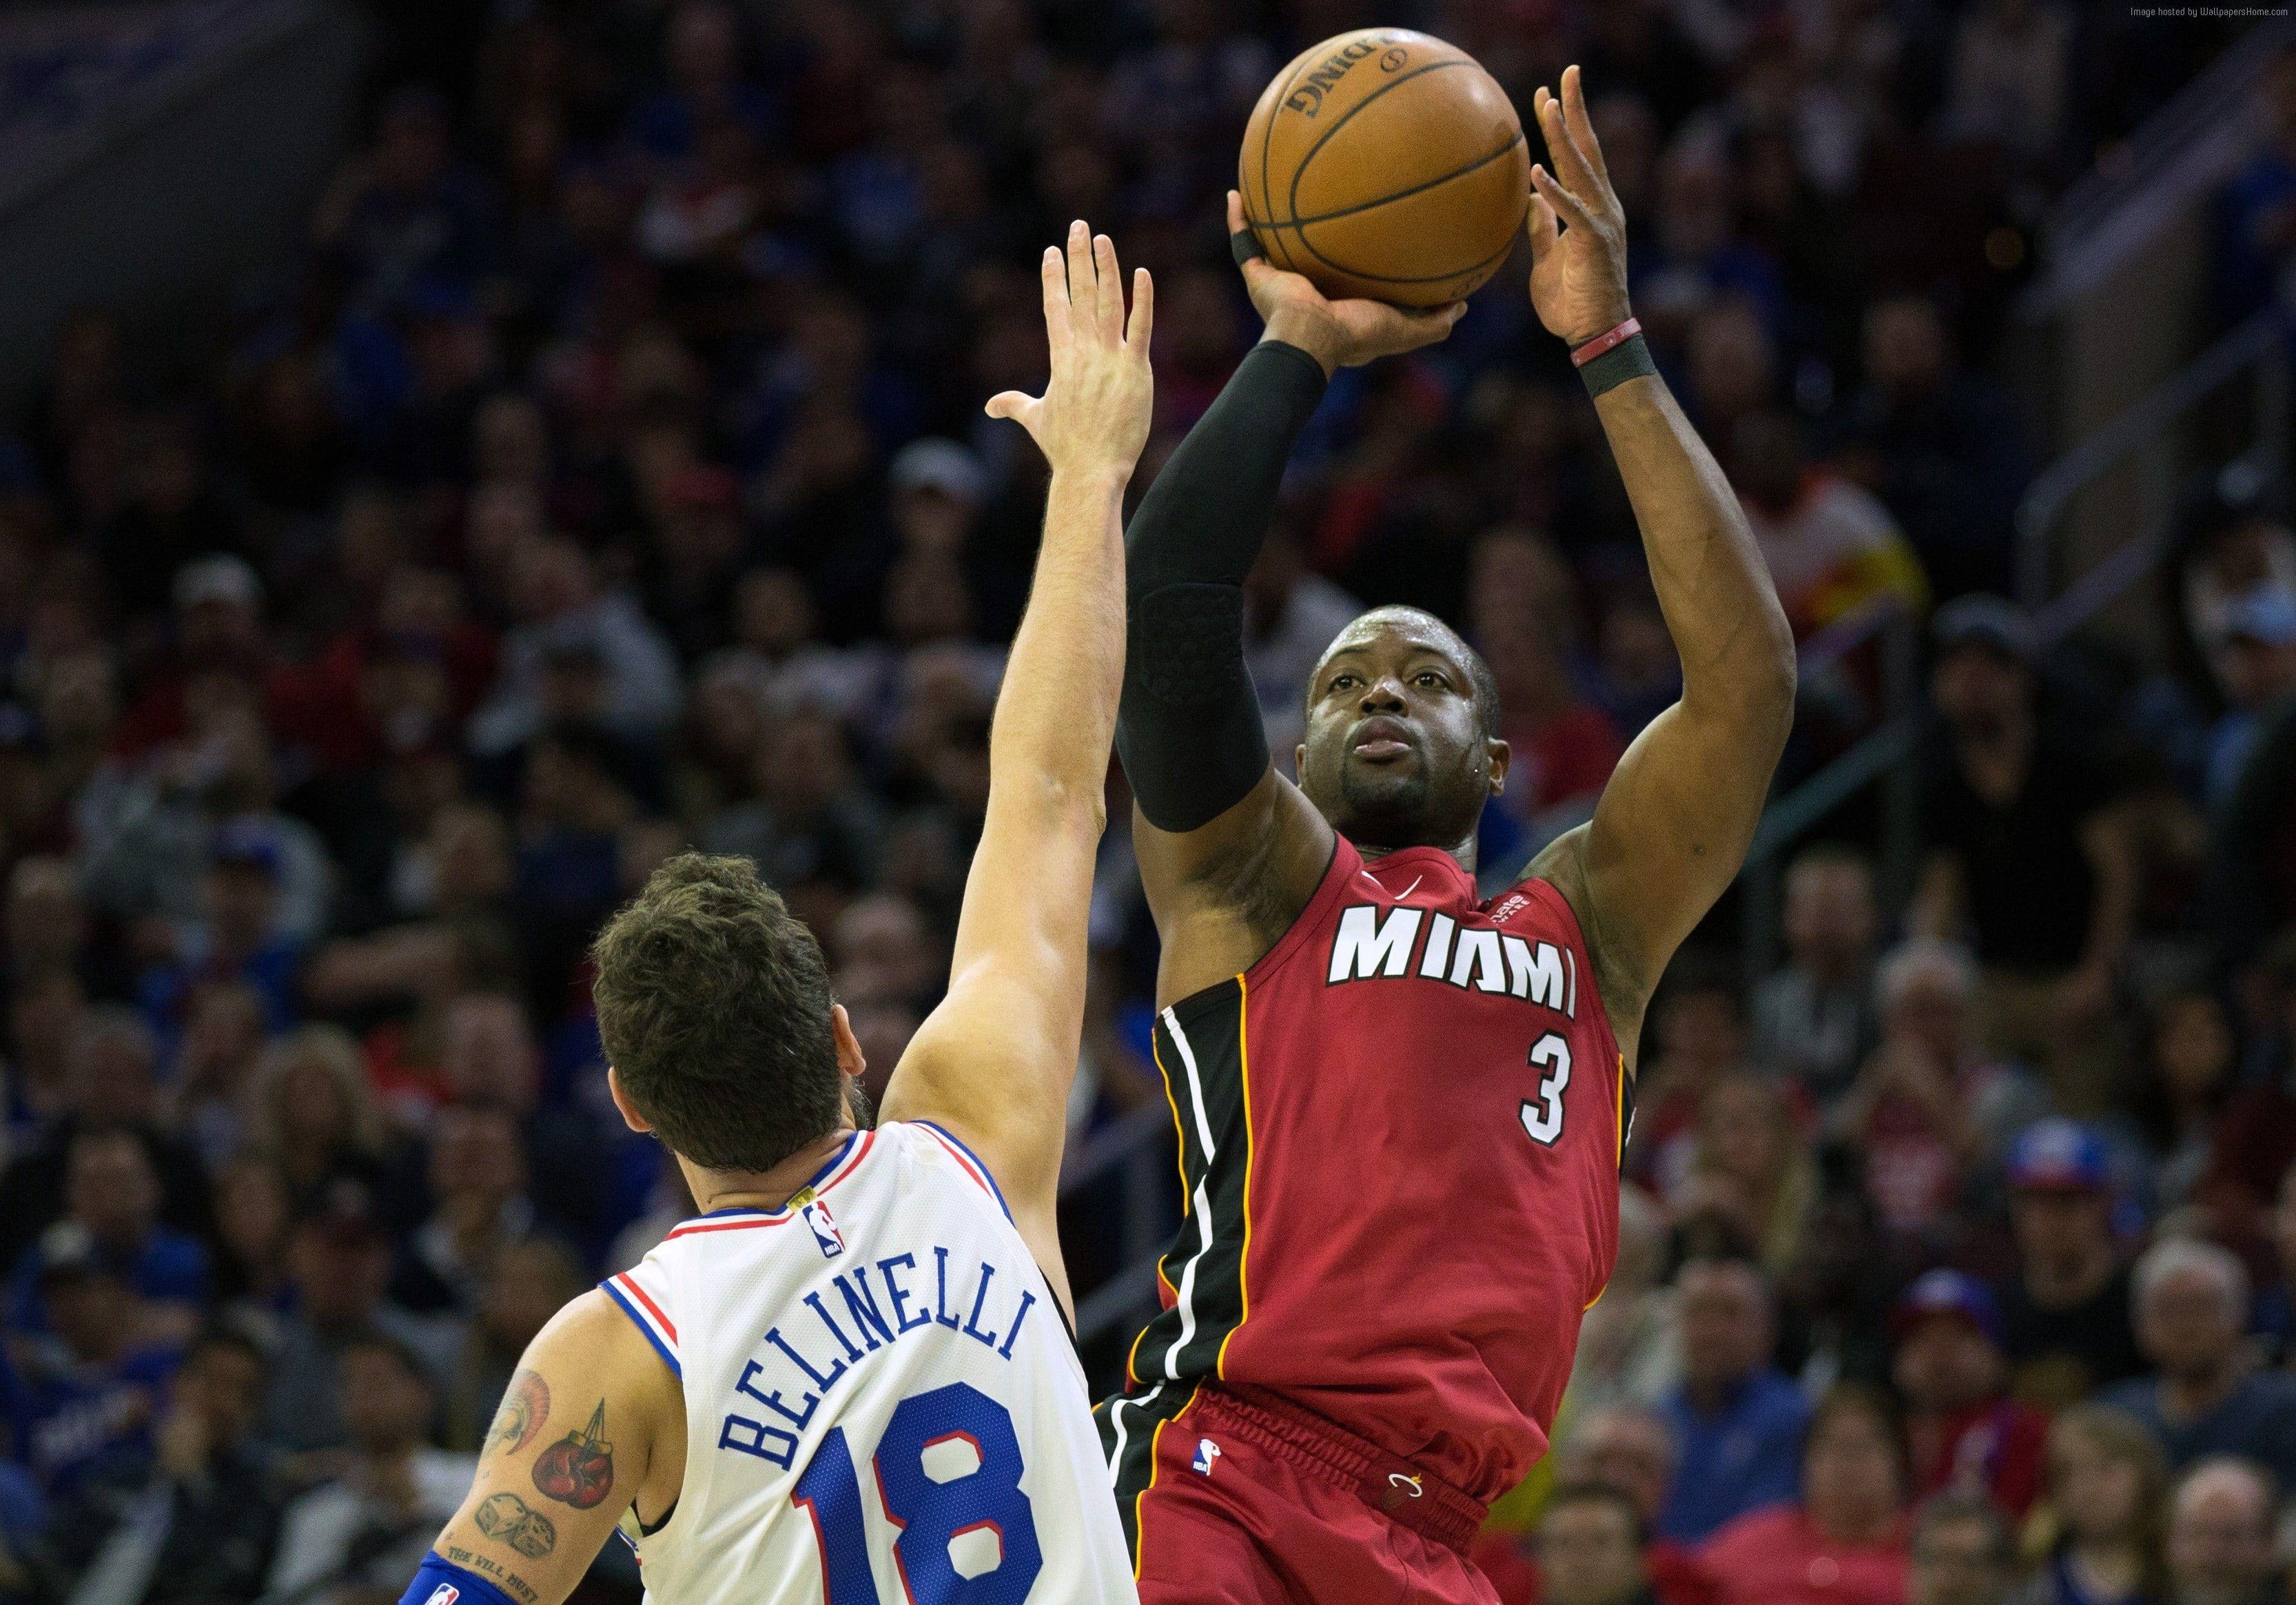 Dwyane Wade 4K basketball NBA Miami Heat 2K wallpaper